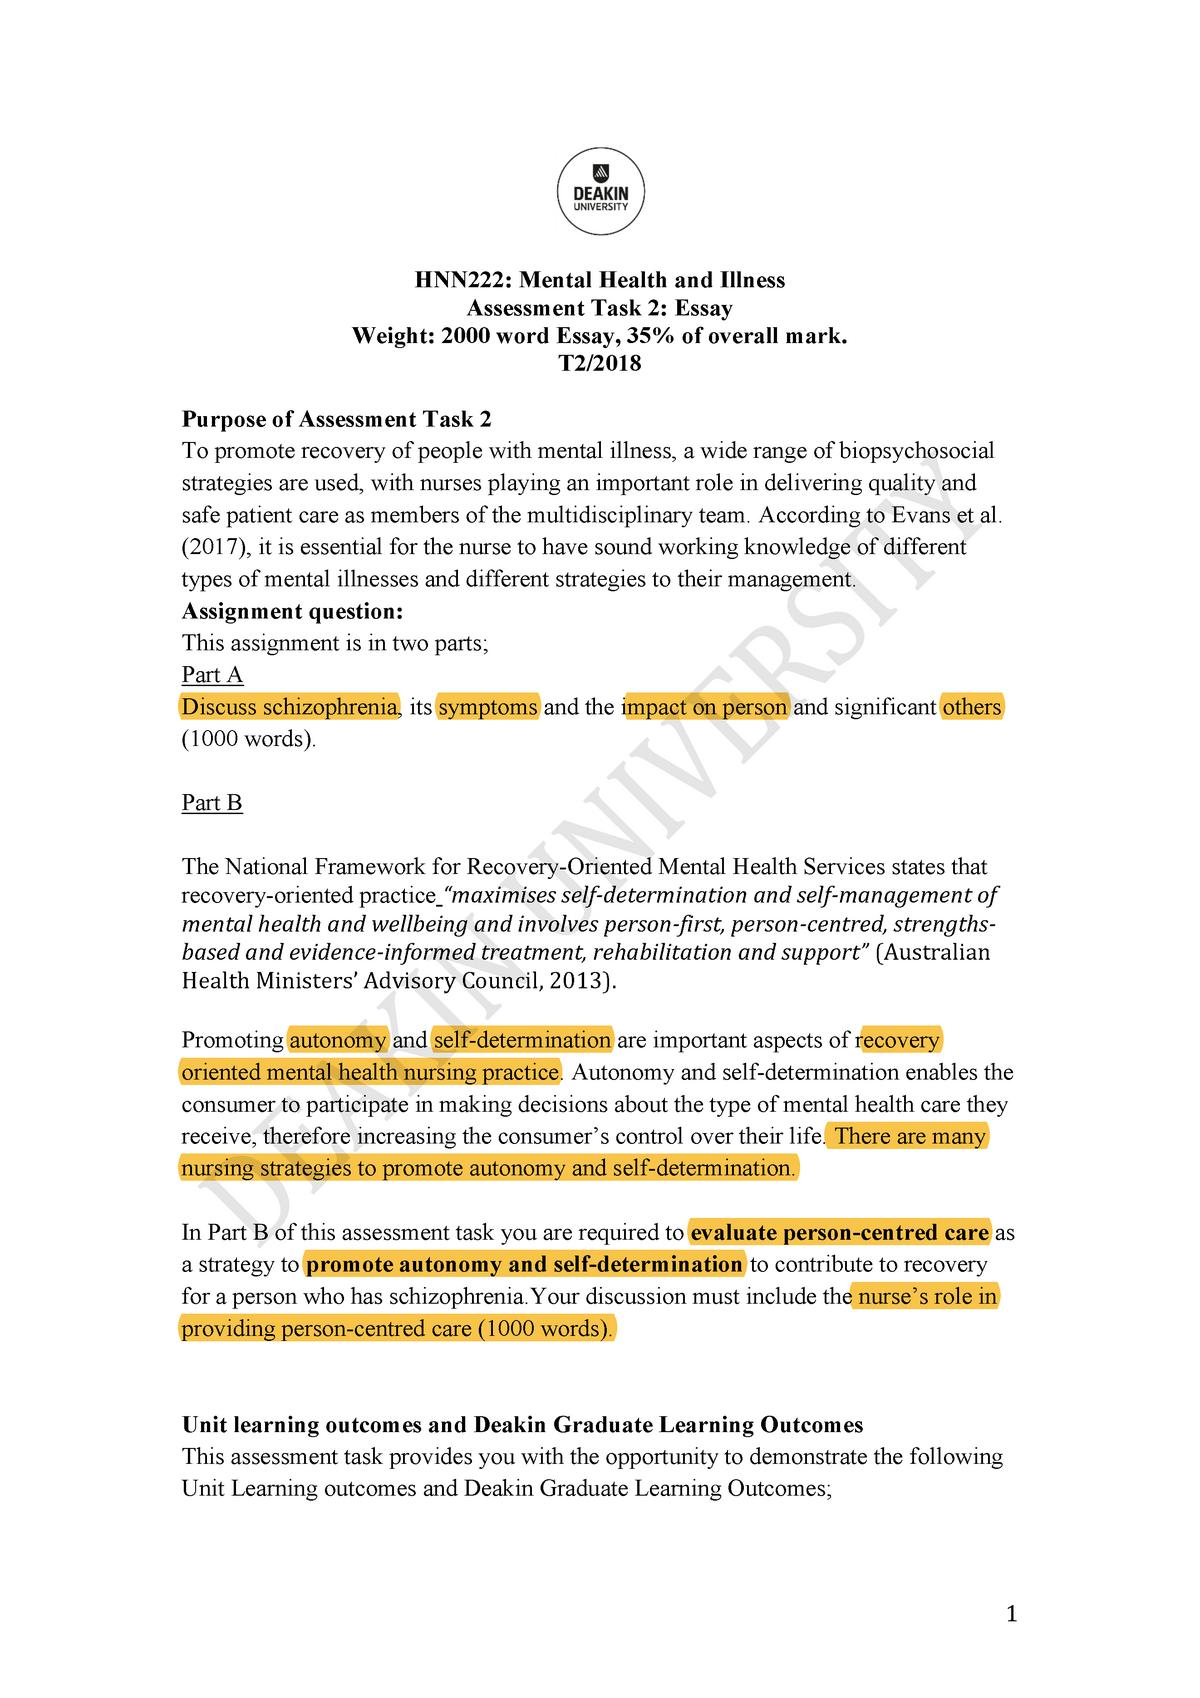 Essays On Pride  Formal Essay Examples also Essay On Purpose Of Education Hnn T  Assessment Task  Essay  Deakin  Studocu Essay Of To Kill A Mockingbird